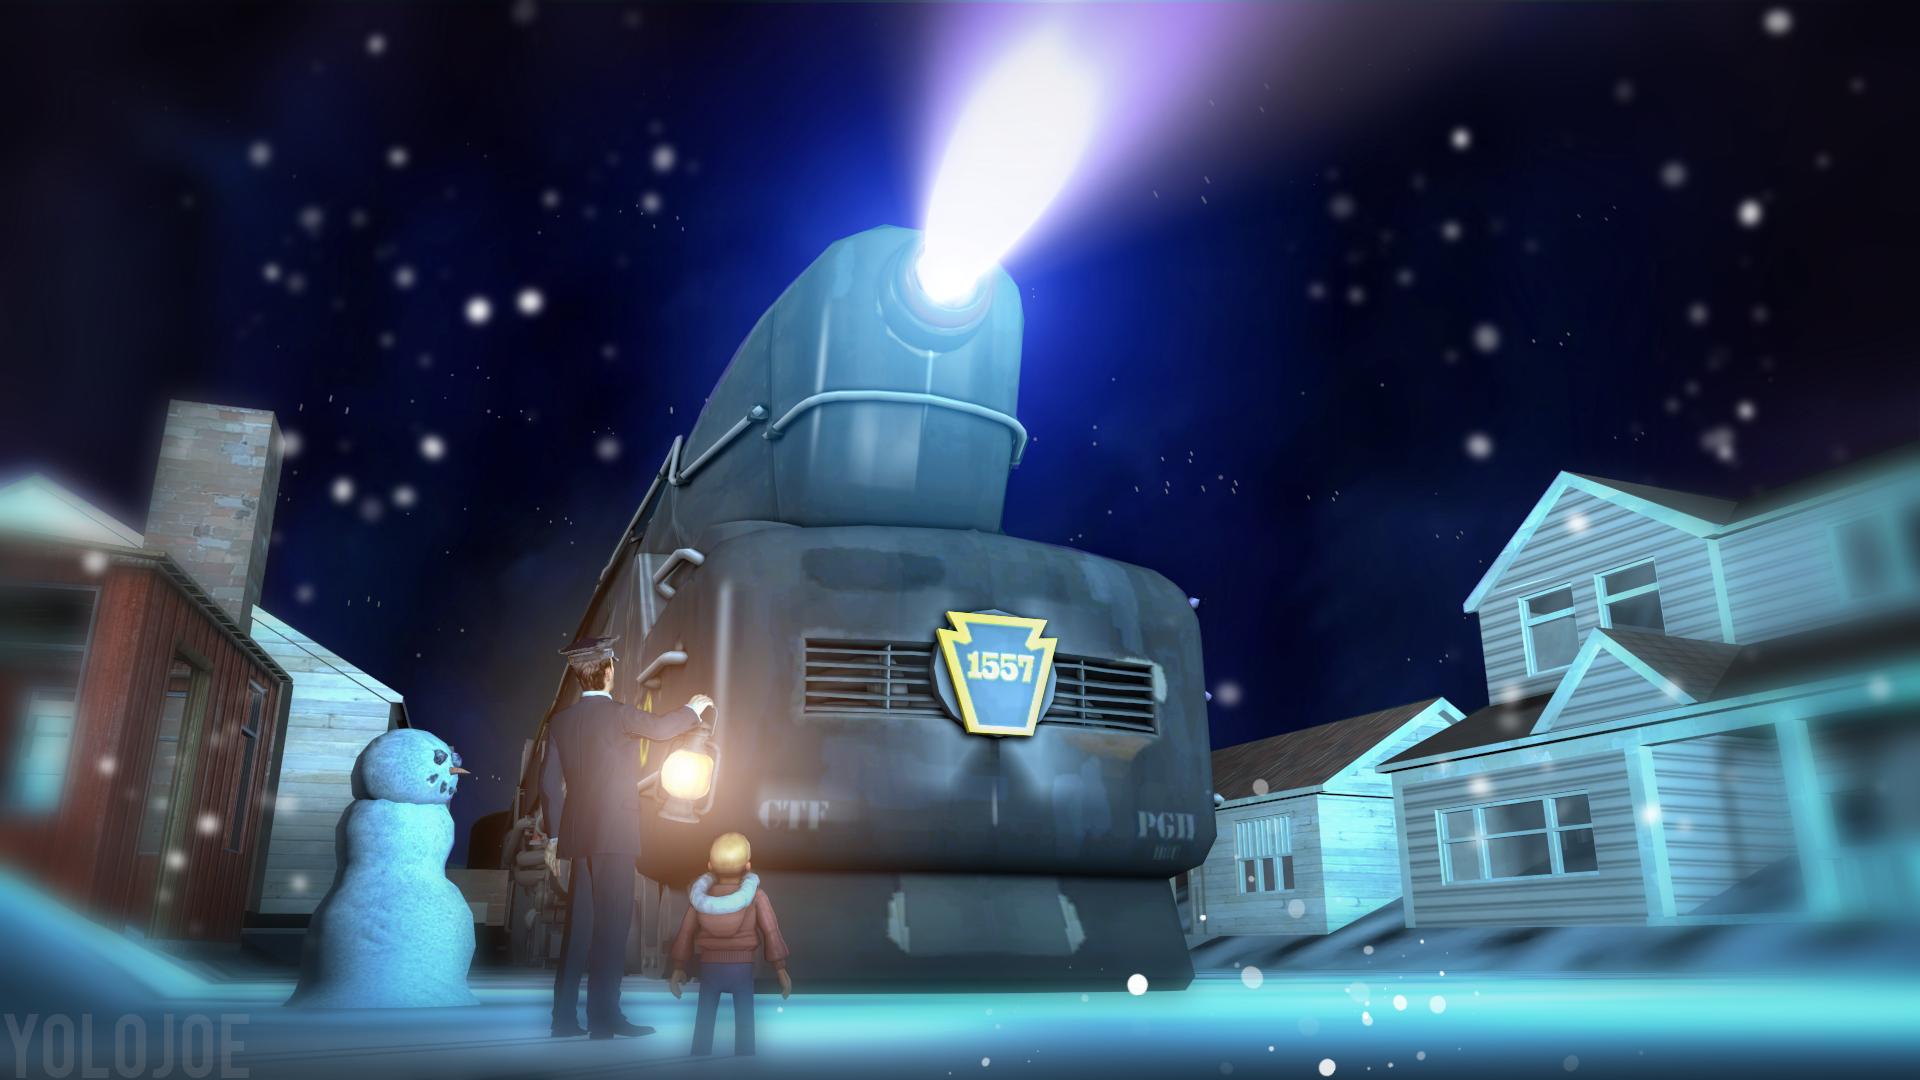 the polar express sfm by yolojoe on deviantart